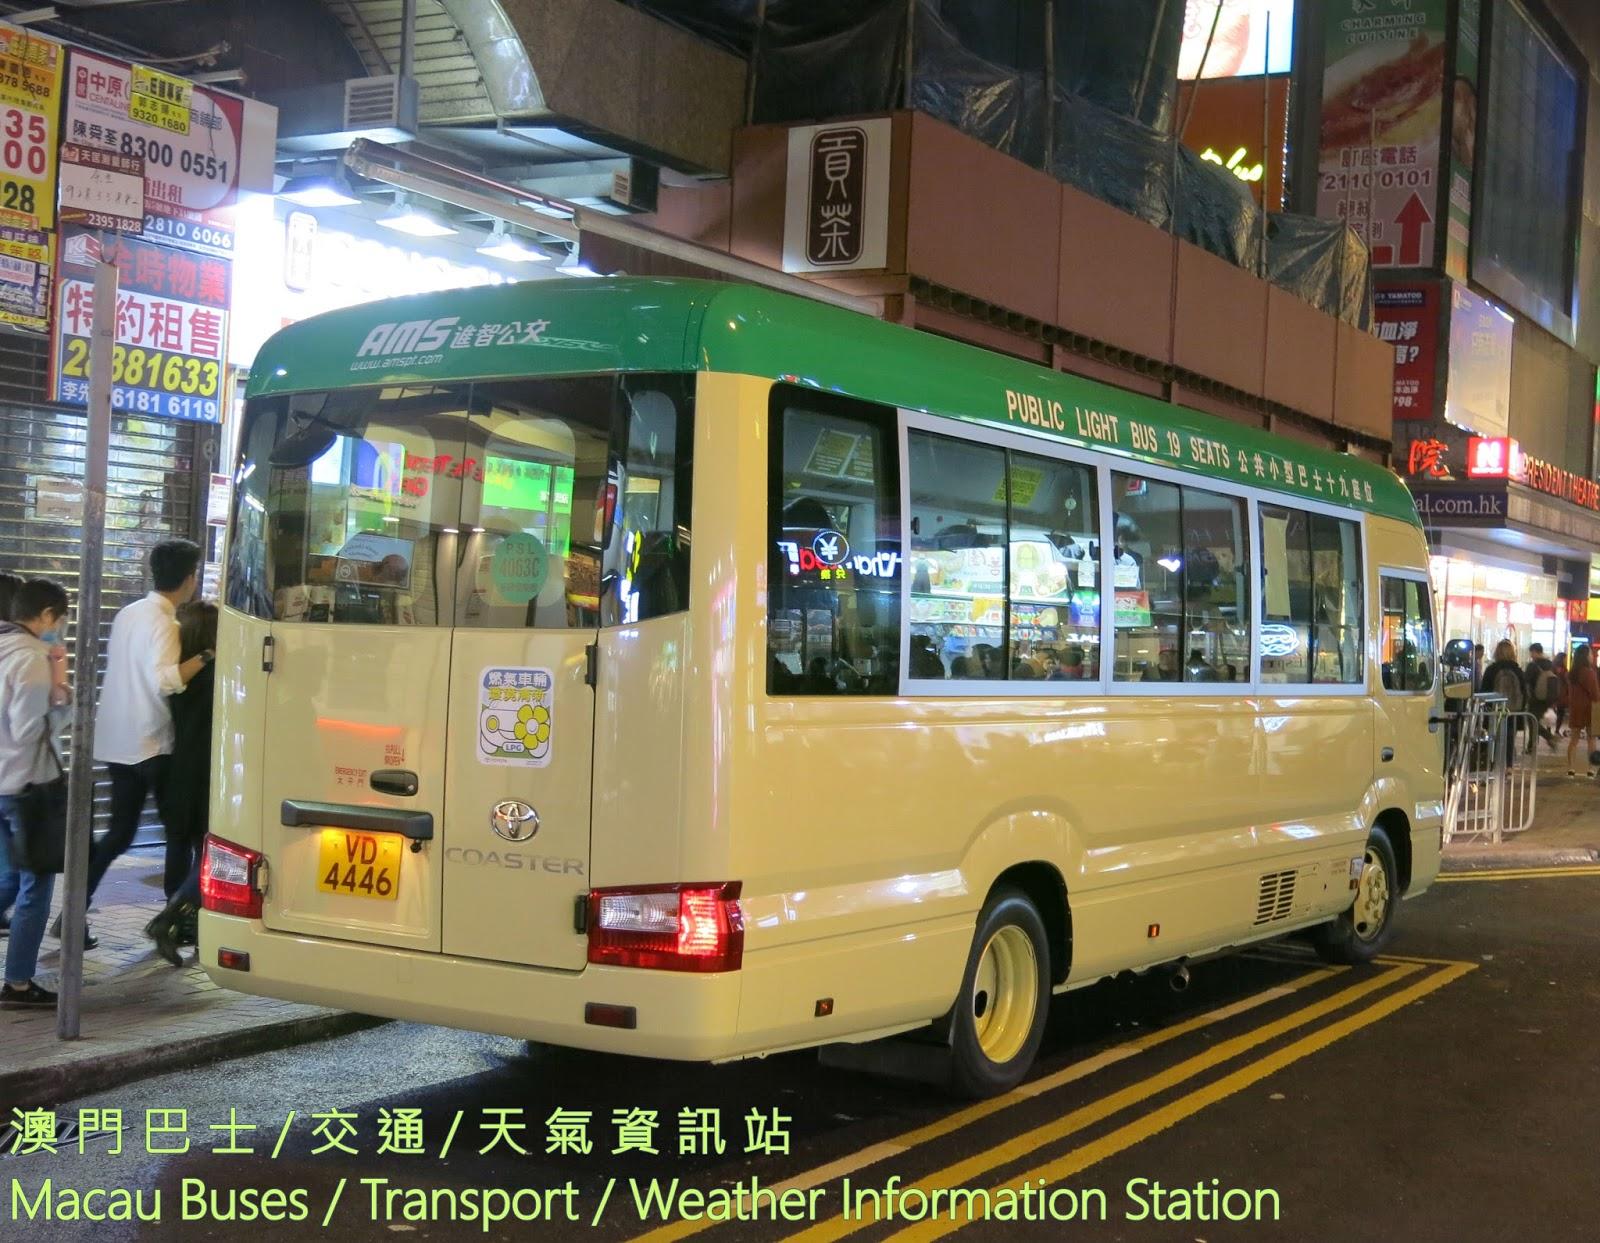 澳 門 巴 士 / 交 通 / 天 氣 資 訊 站 Macau Buses / Transport / Weather Information Station: 十二月 2017